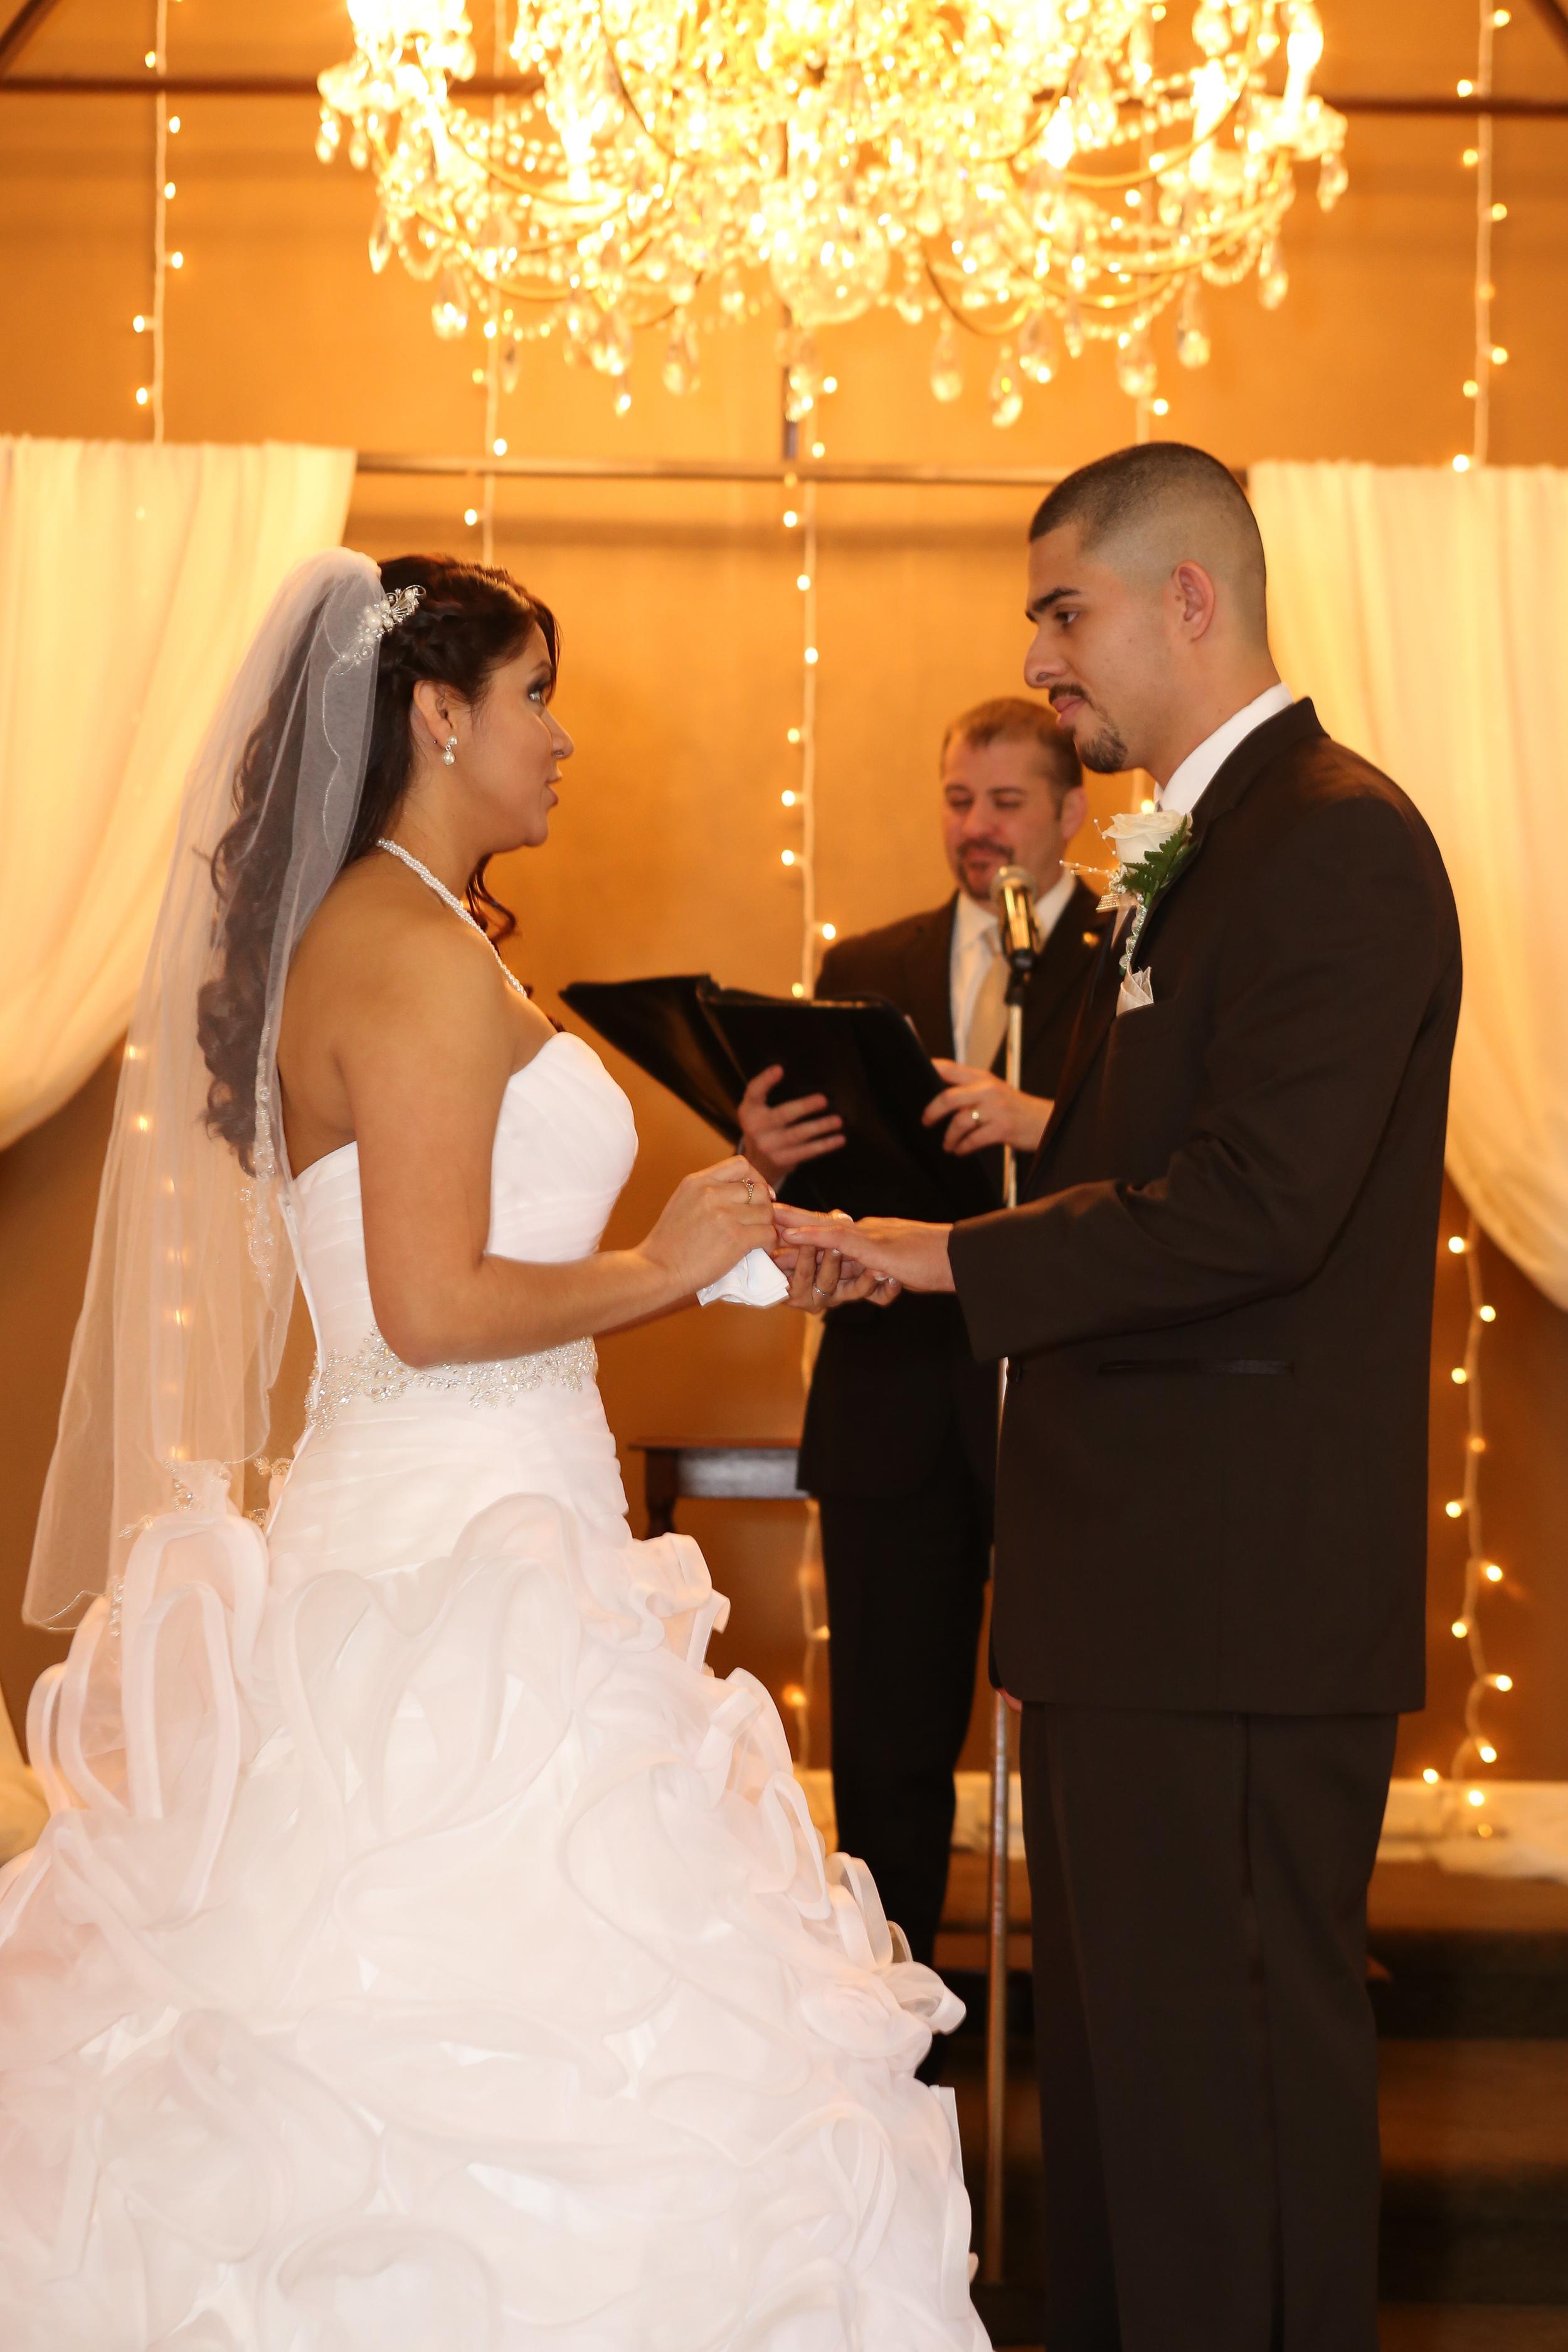 Bountiful wedding photographer at ceremony